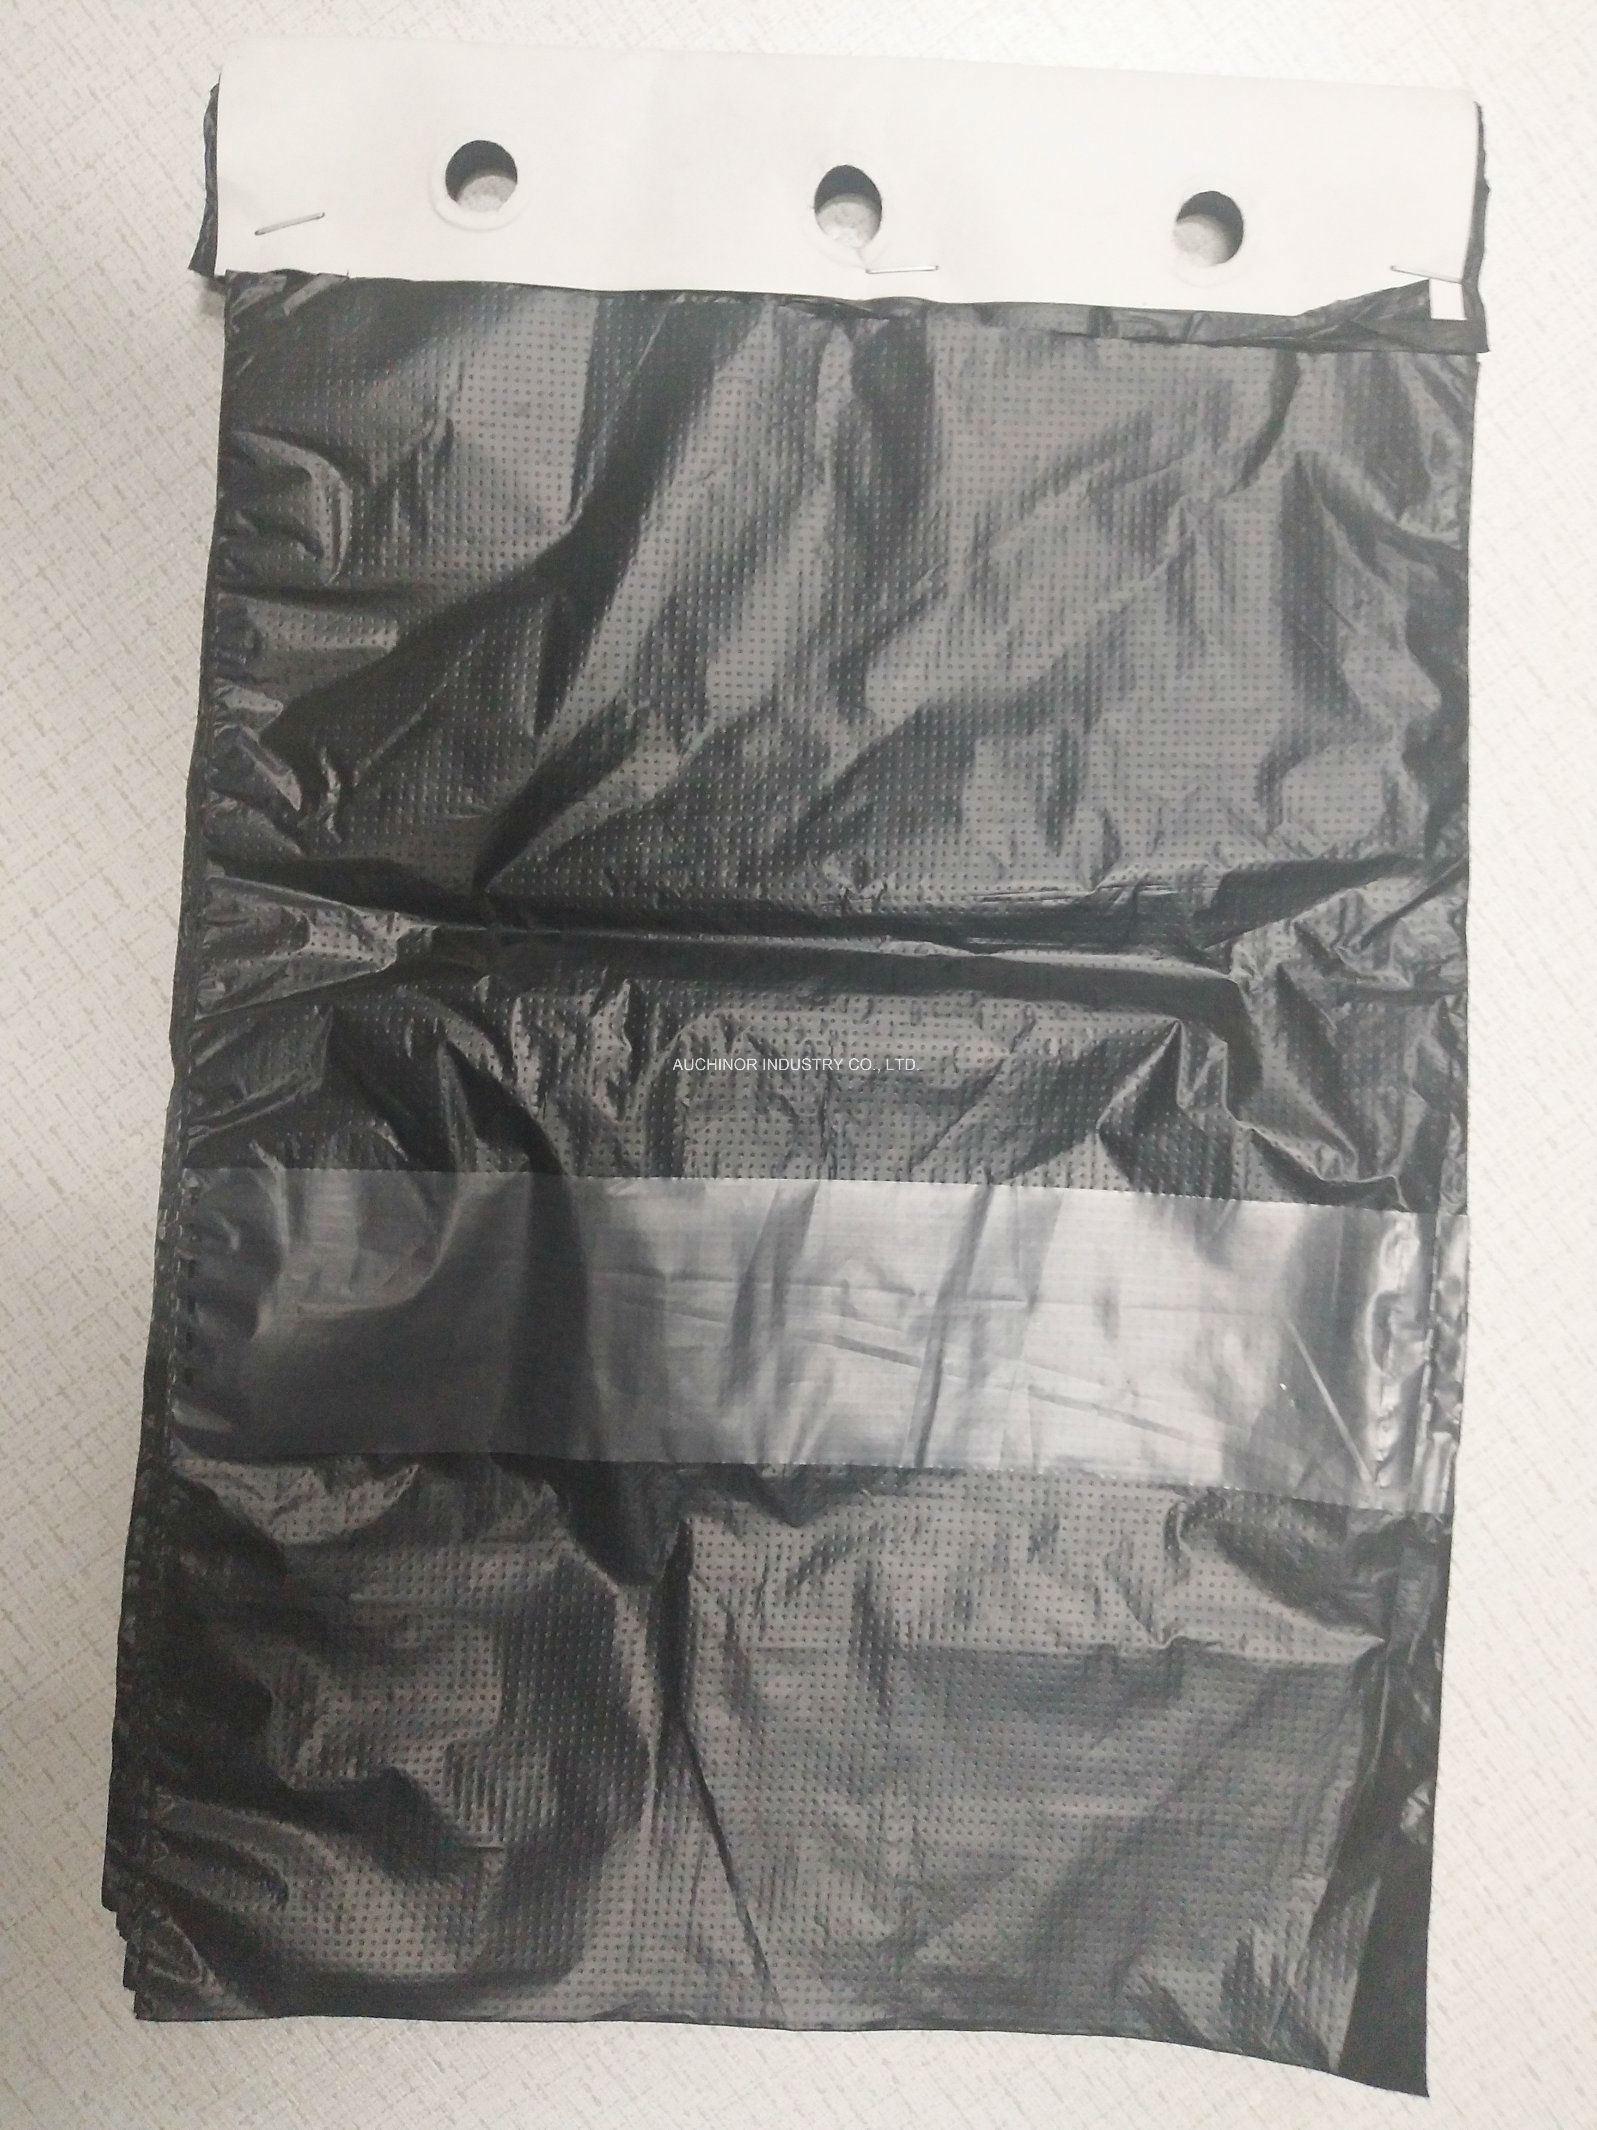 Black or Grey Dog Poop Bag